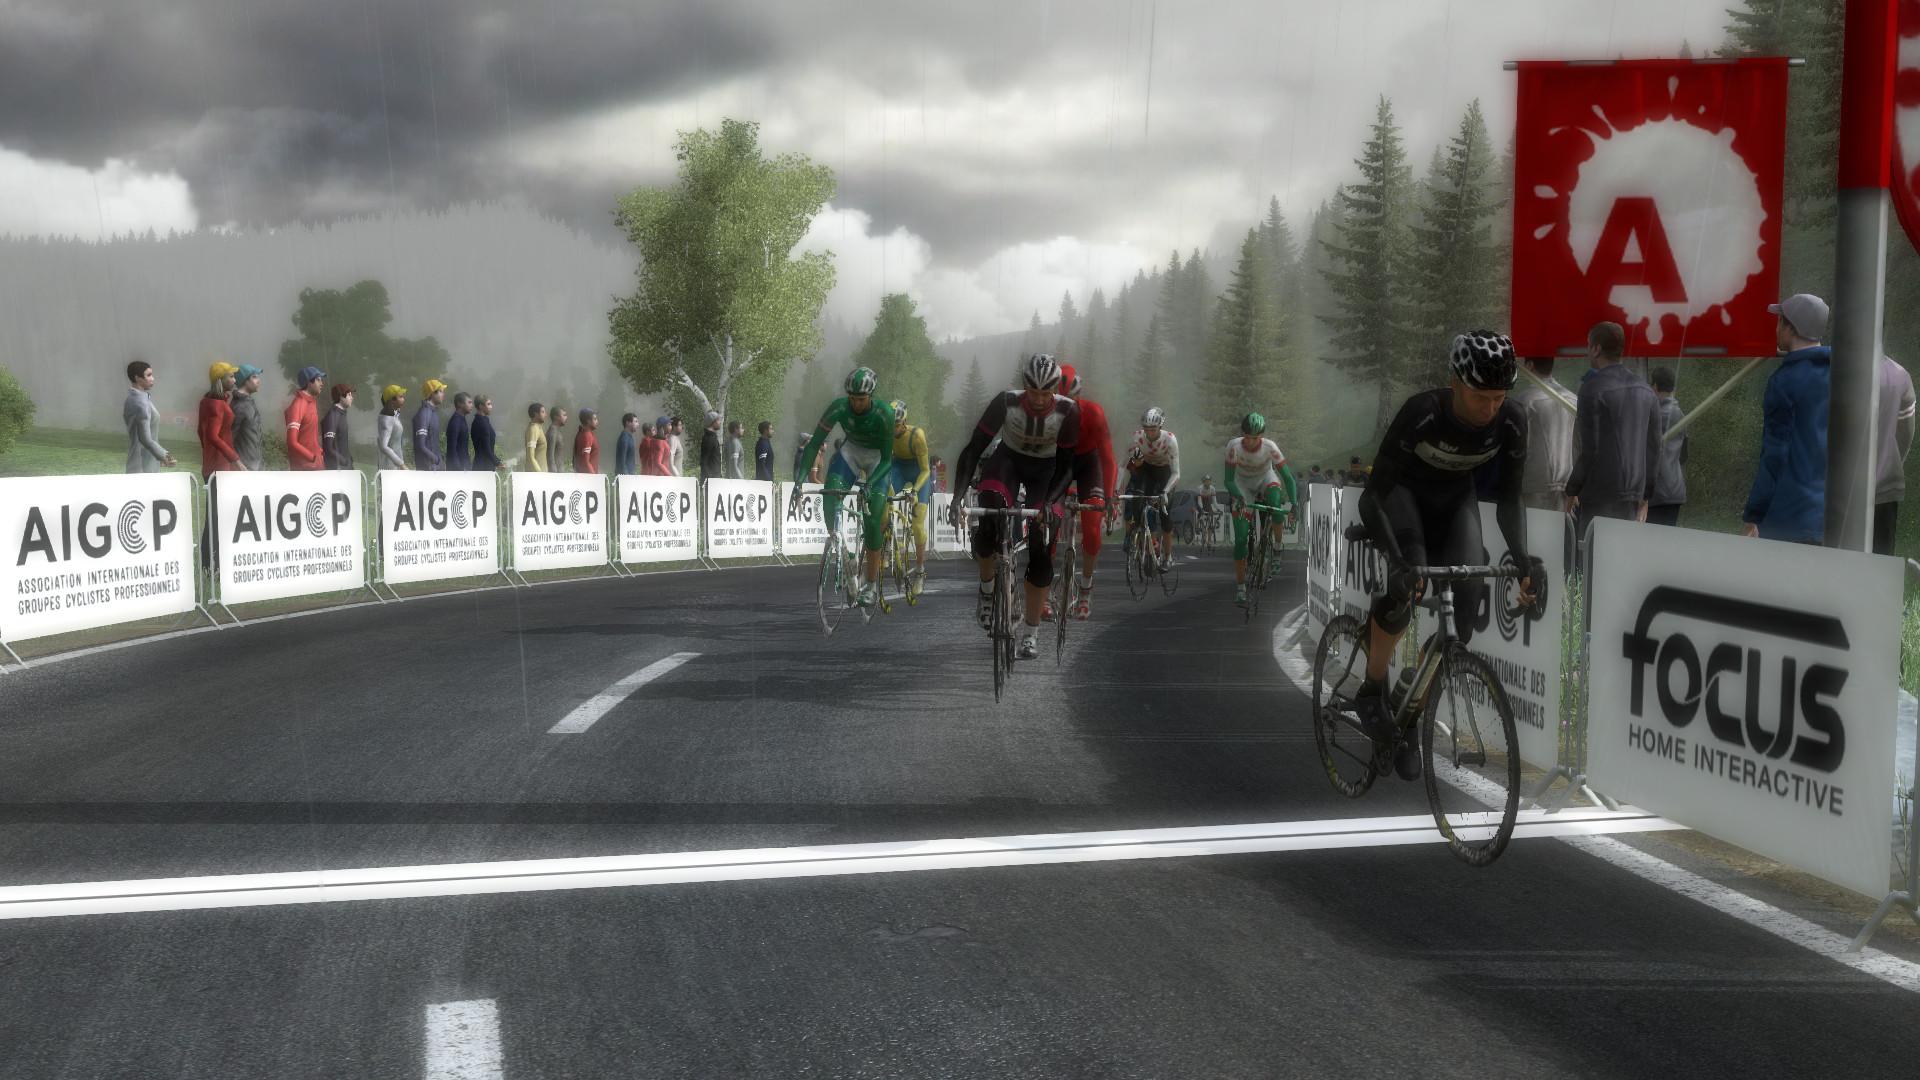 pcmdaily.com/images/mg/2019/Races/PTHC/Pologne/E5/05.jpg